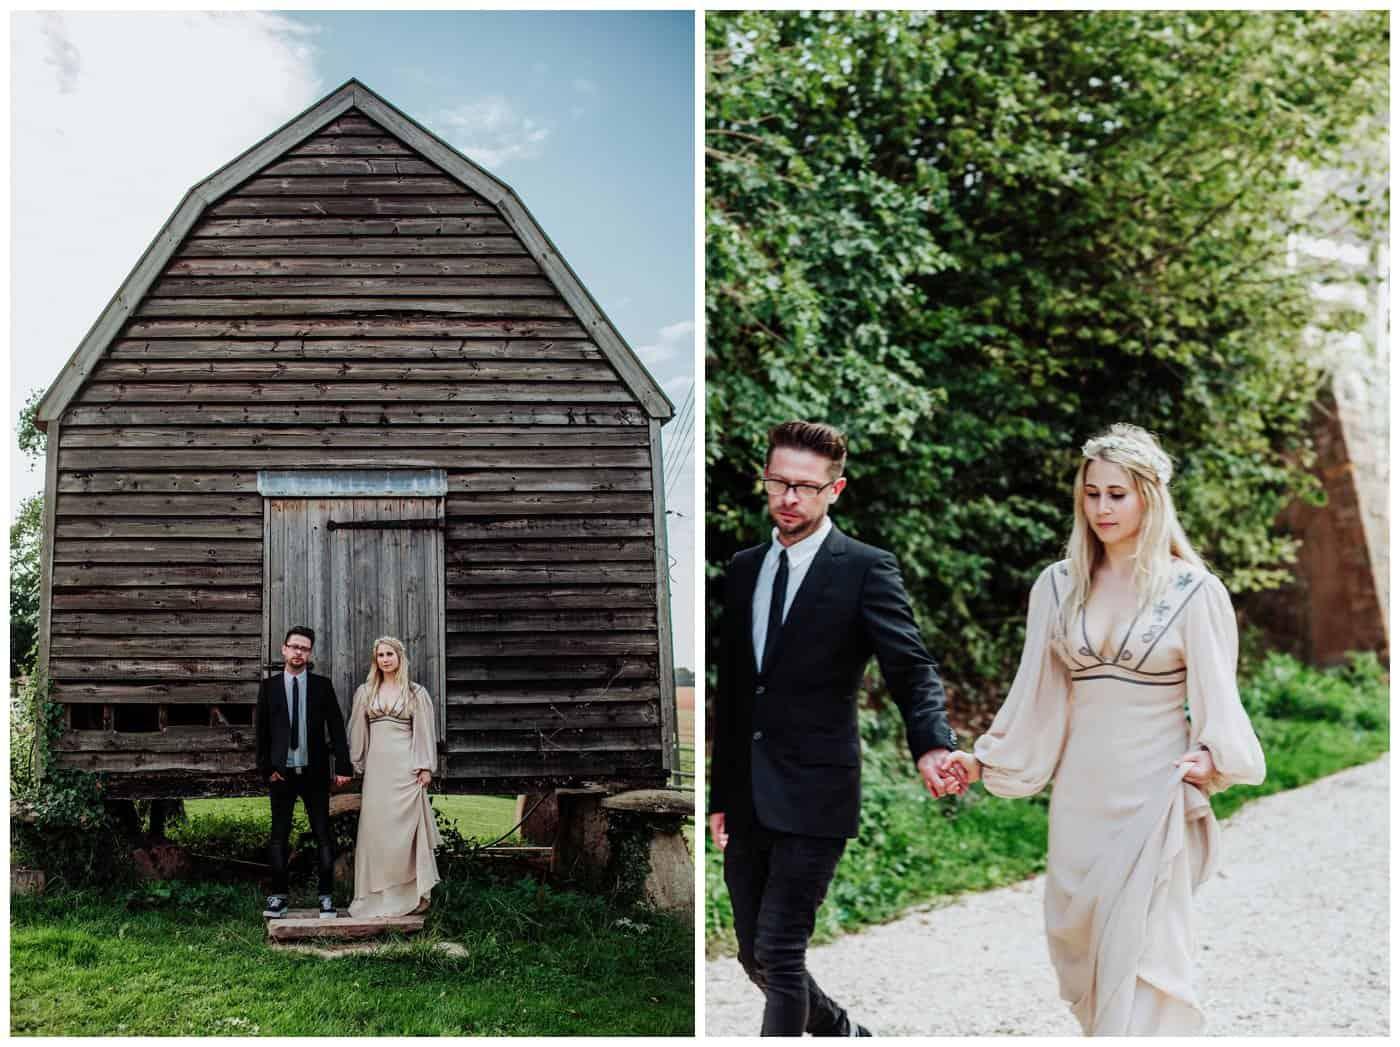 Huntstile Organic Farm Wedding Photos